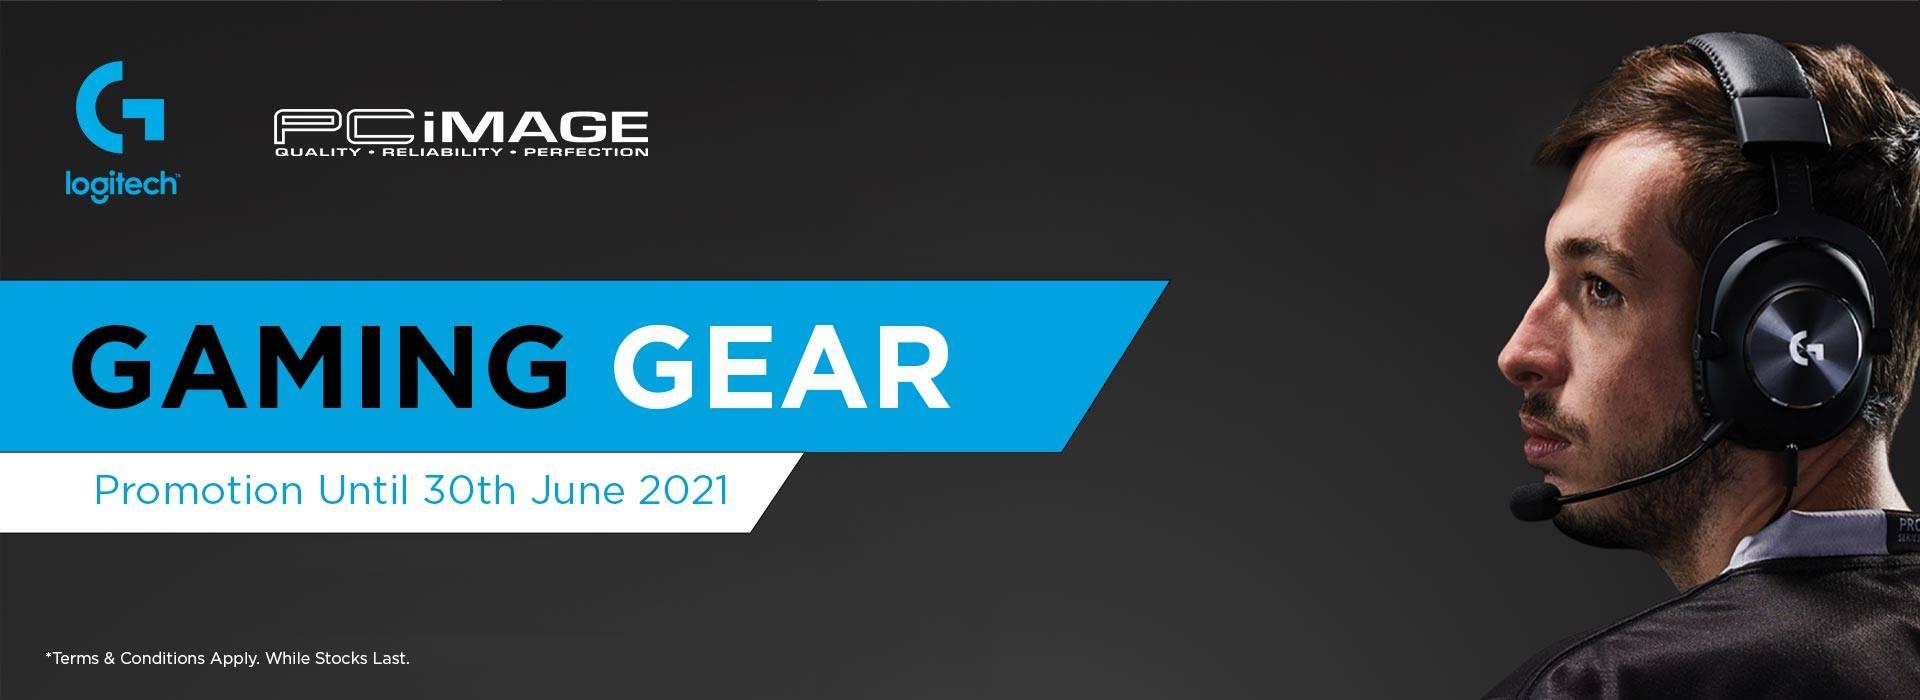 Logitech Gaming Gear 30 June